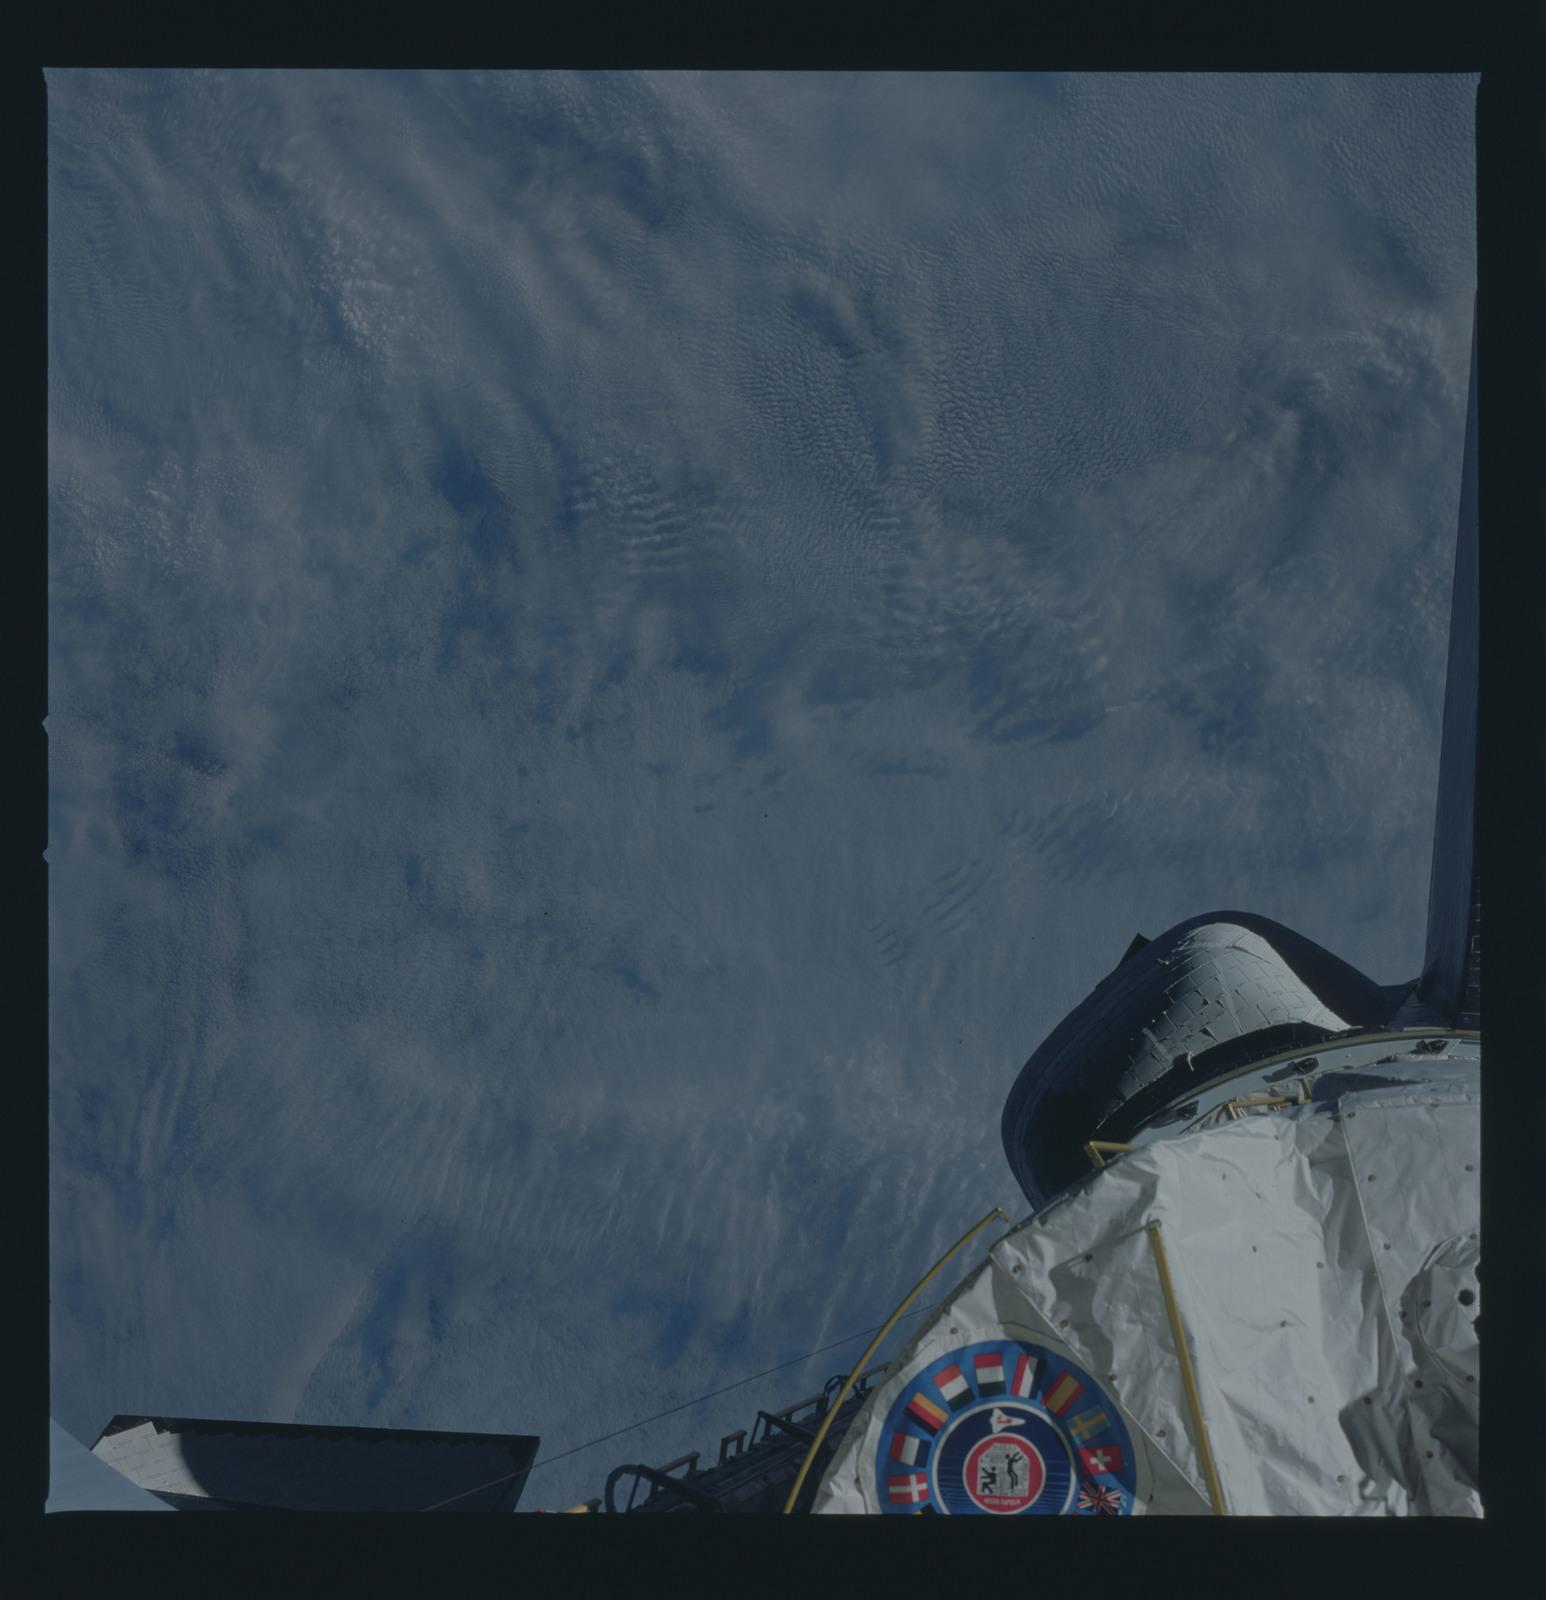 51B-44-023 - STS-51B - 51B earth observation